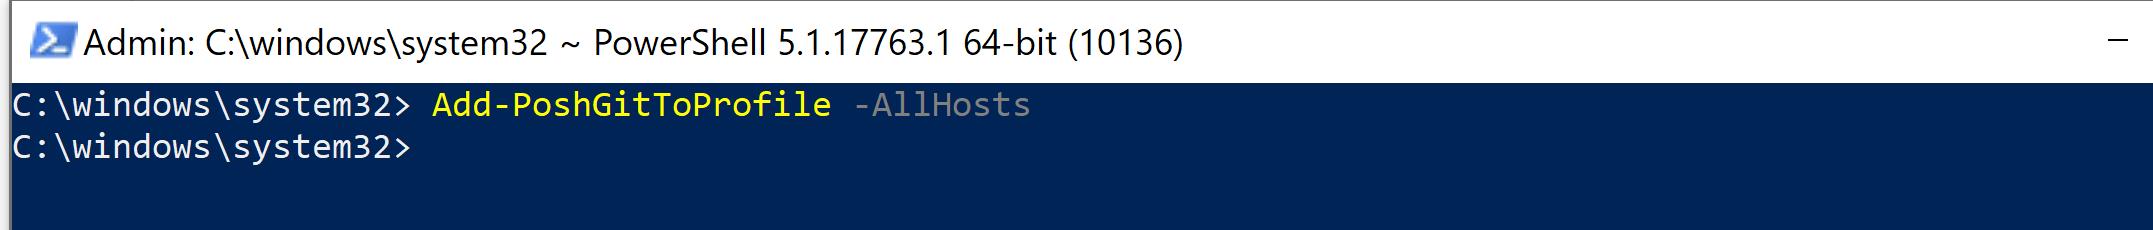 importmoduleallhosts.png